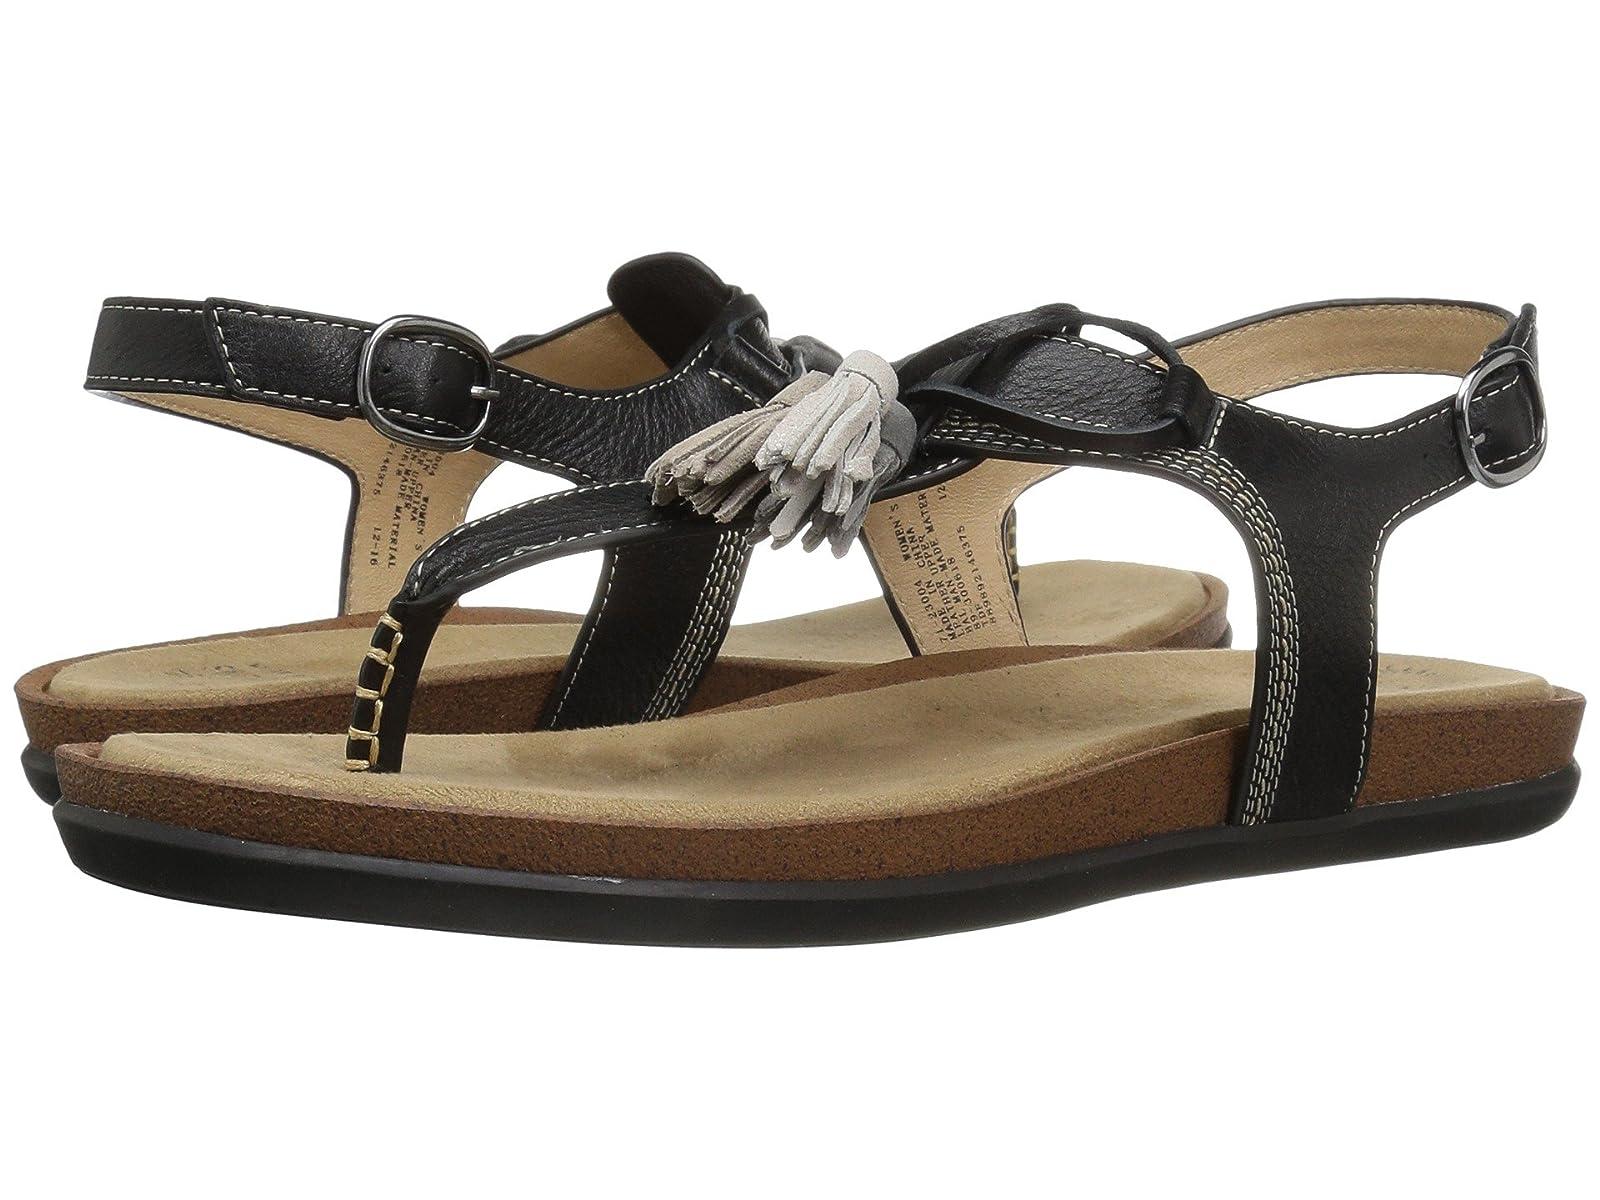 G.H. Bass & Co. SadieCheap and distinctive eye-catching shoes